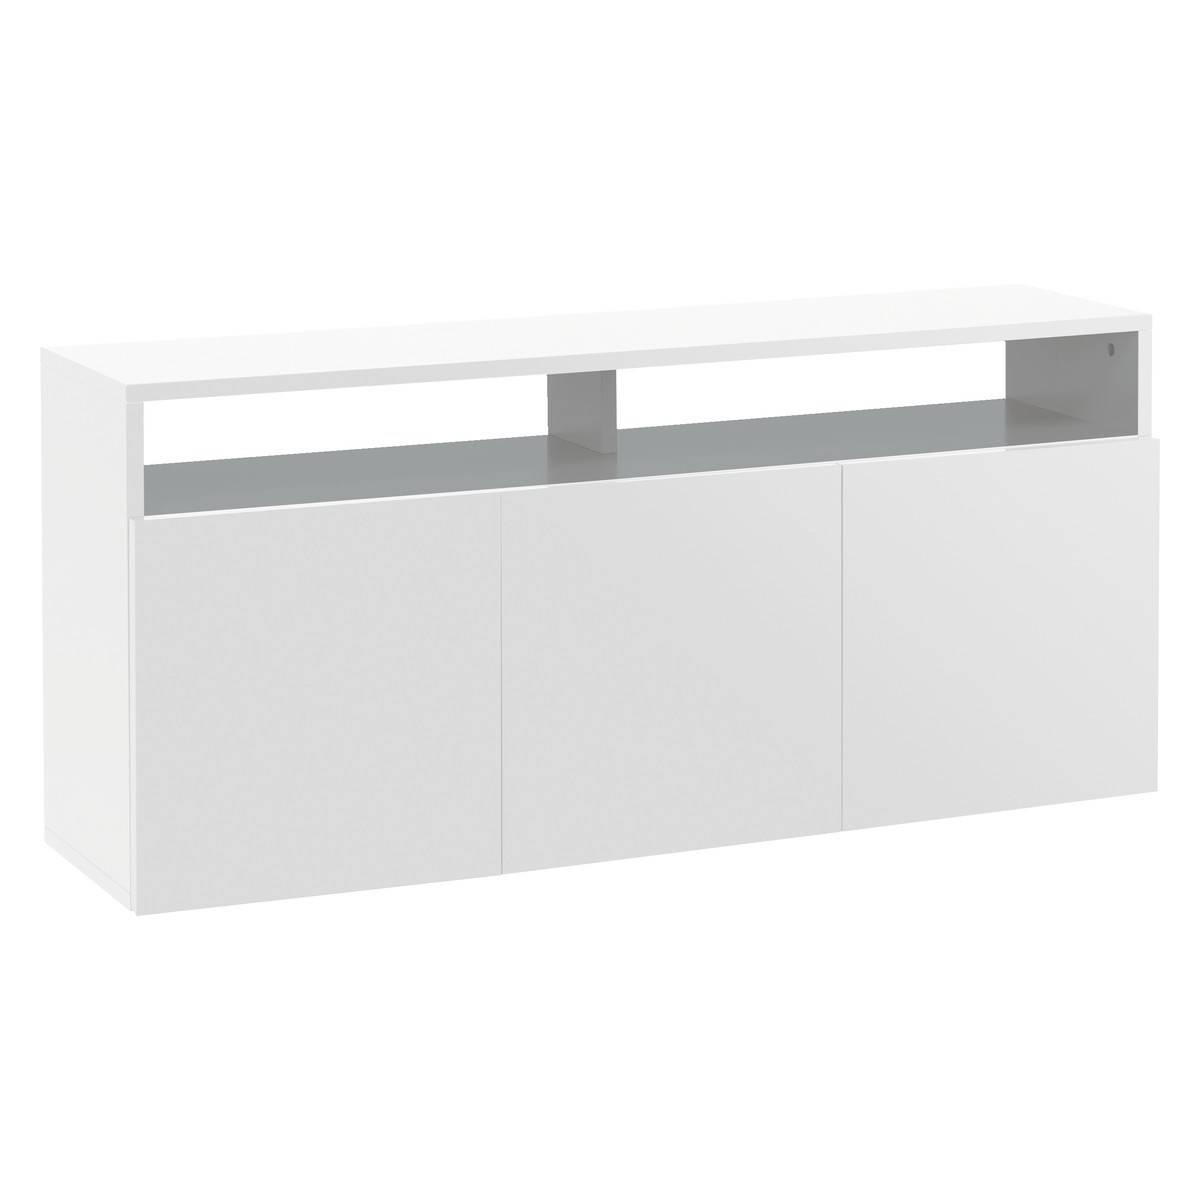 Kubrik White High Gloss Large Sideboard | Buy Now At Habitat Uk In Large White Sideboards (#7 of 15)